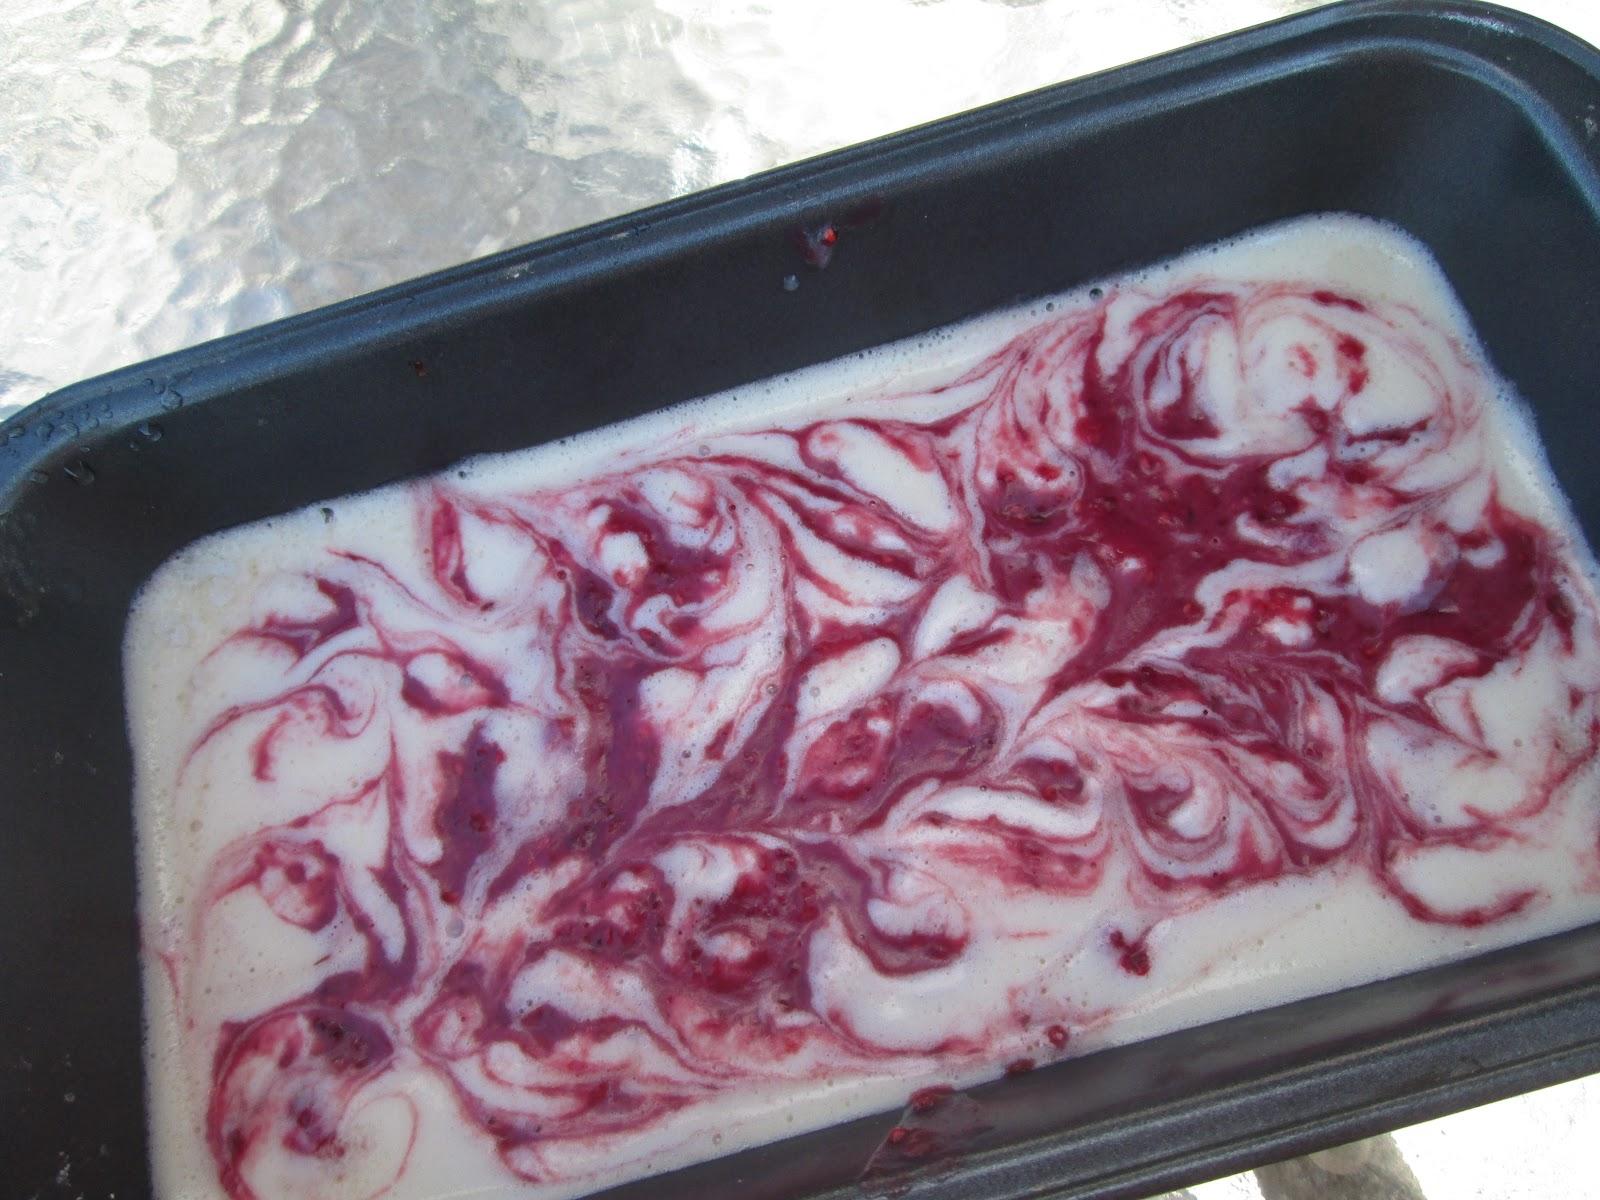 Canela kitchen: White chocolate and raspberry fudge dessert